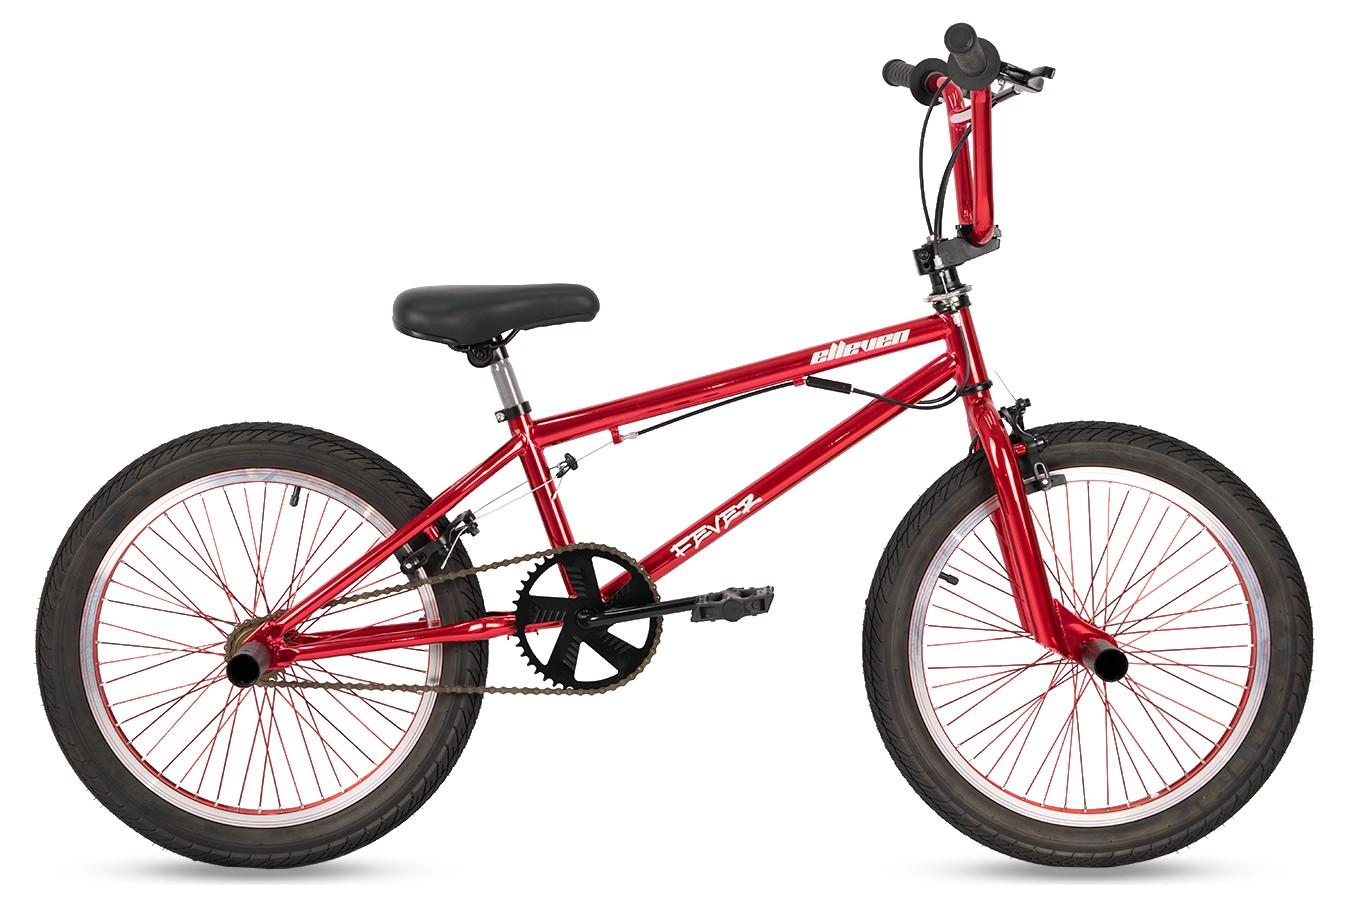 Bicicleta aro 20 Cross Fever - Elleven